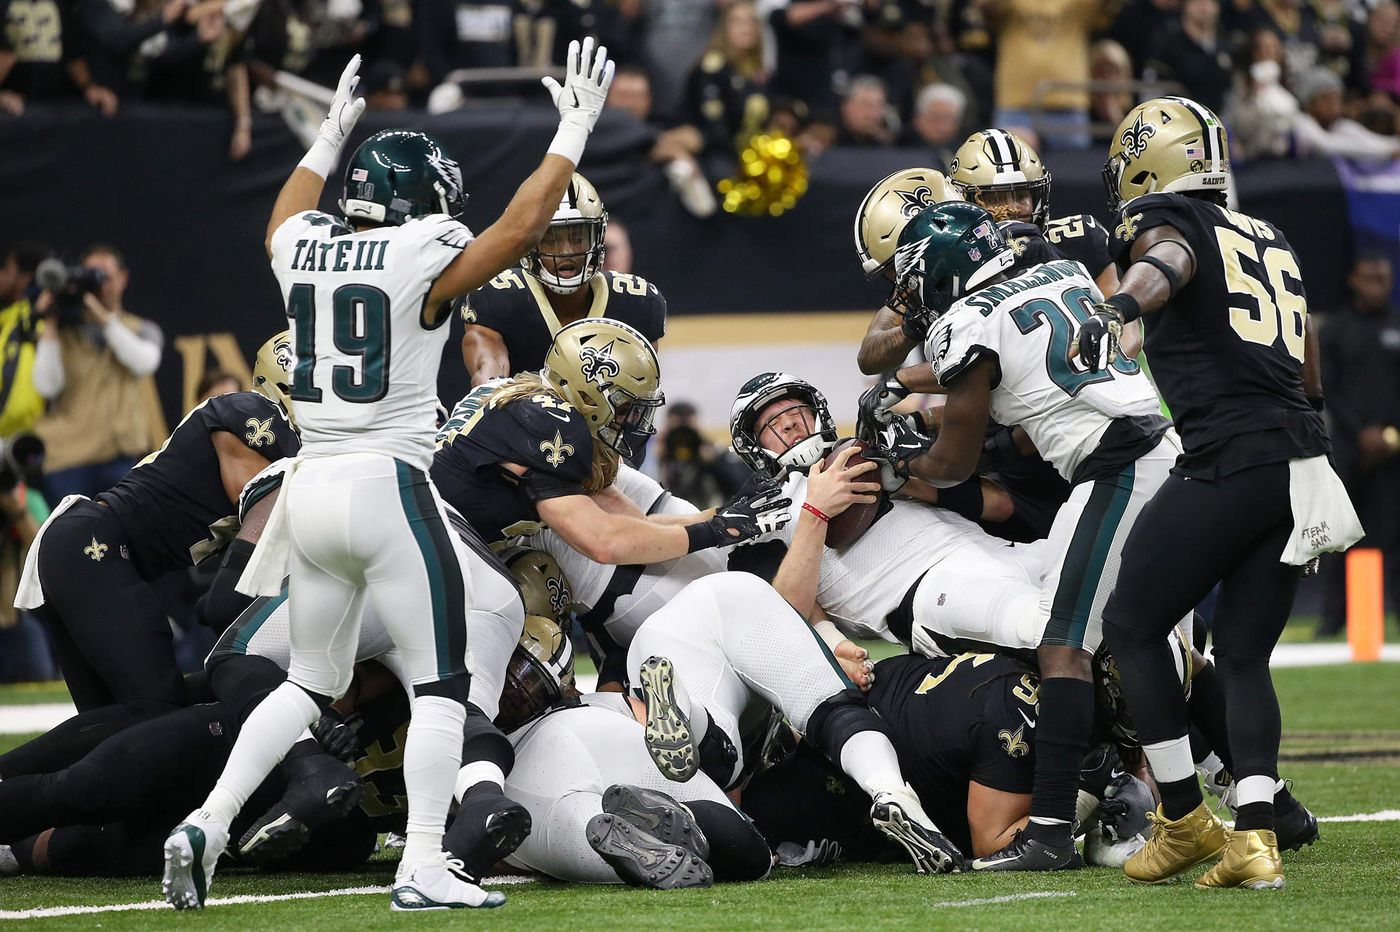 Doug Pederson trending down, Jordan Matthews trending up after Eagles' playoff loss to Saints